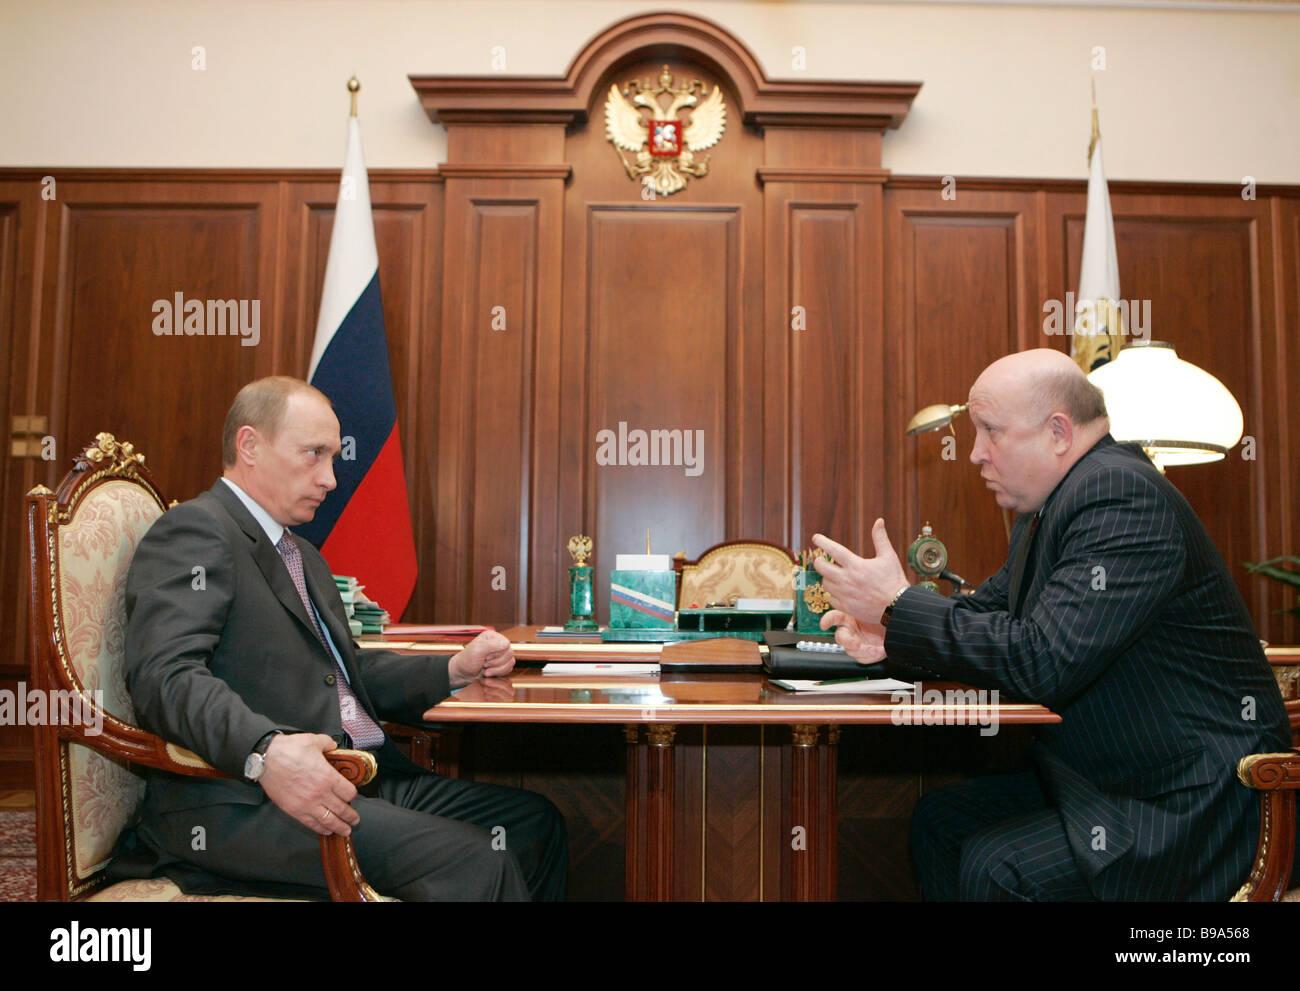 President elects new heads of Karelia, Sverdlovsk and Irkutsk regions 23.05.2012 67